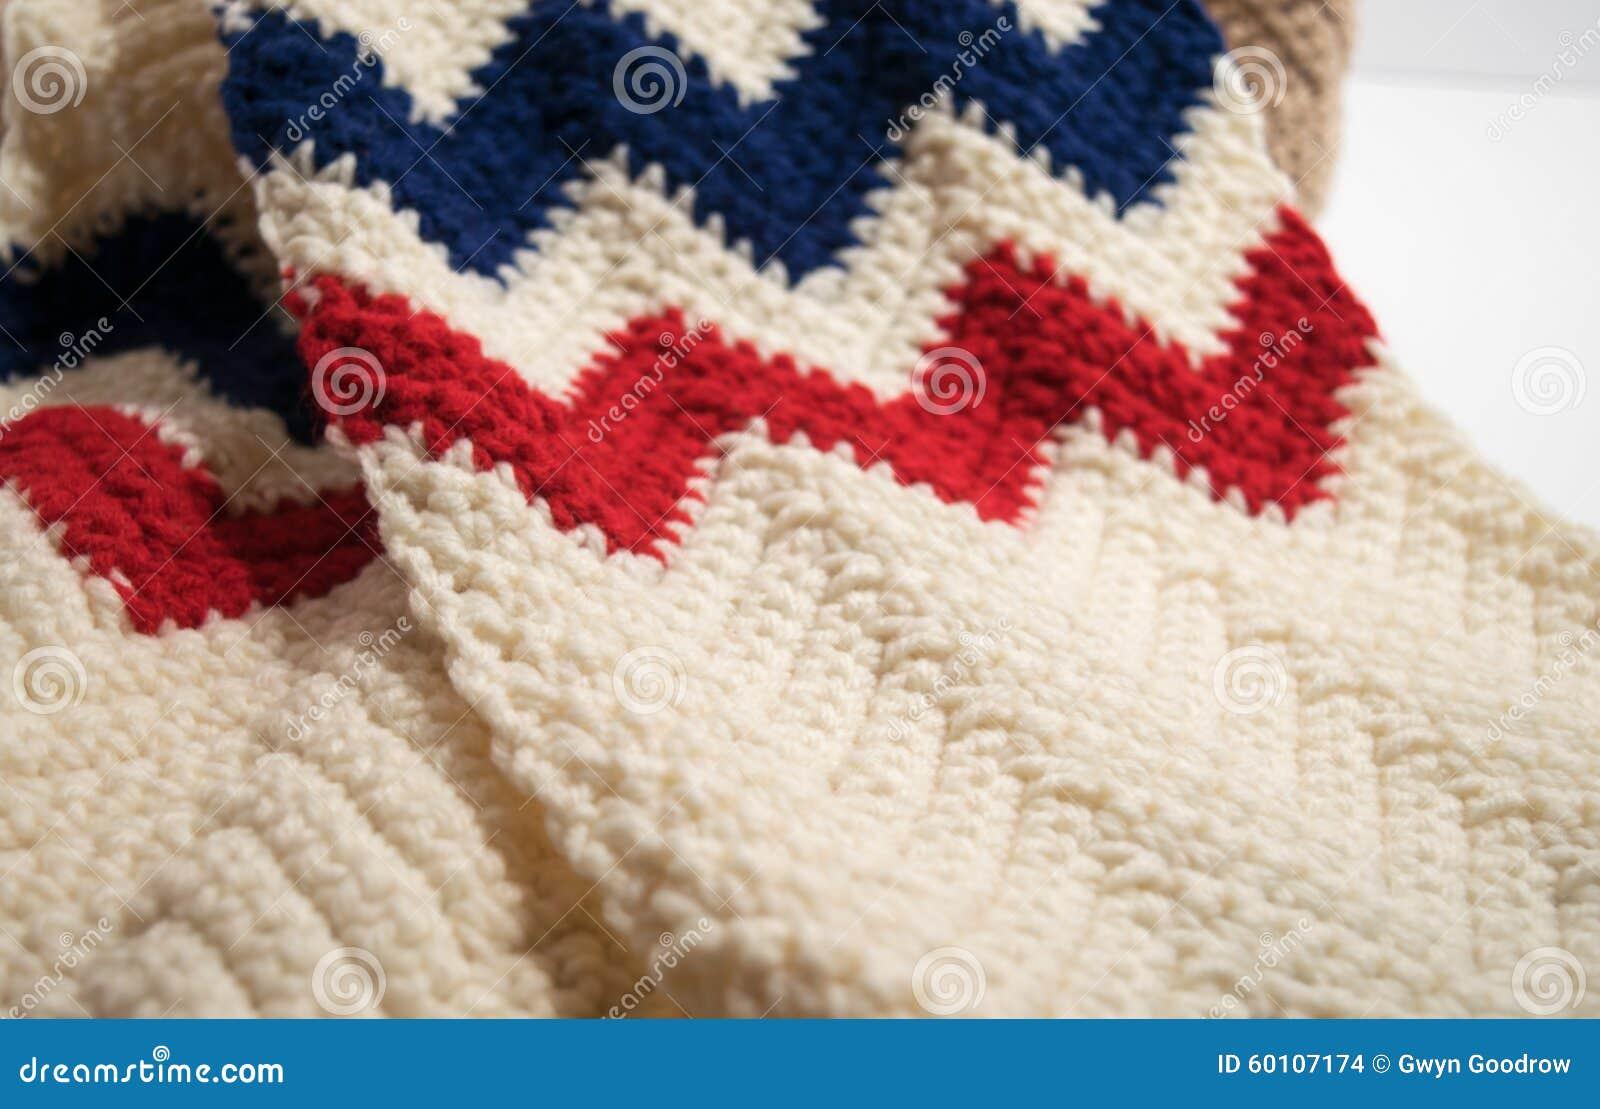 USA Patriotic Scarf In Single Crochet Stitches Stock Photo - Image ...